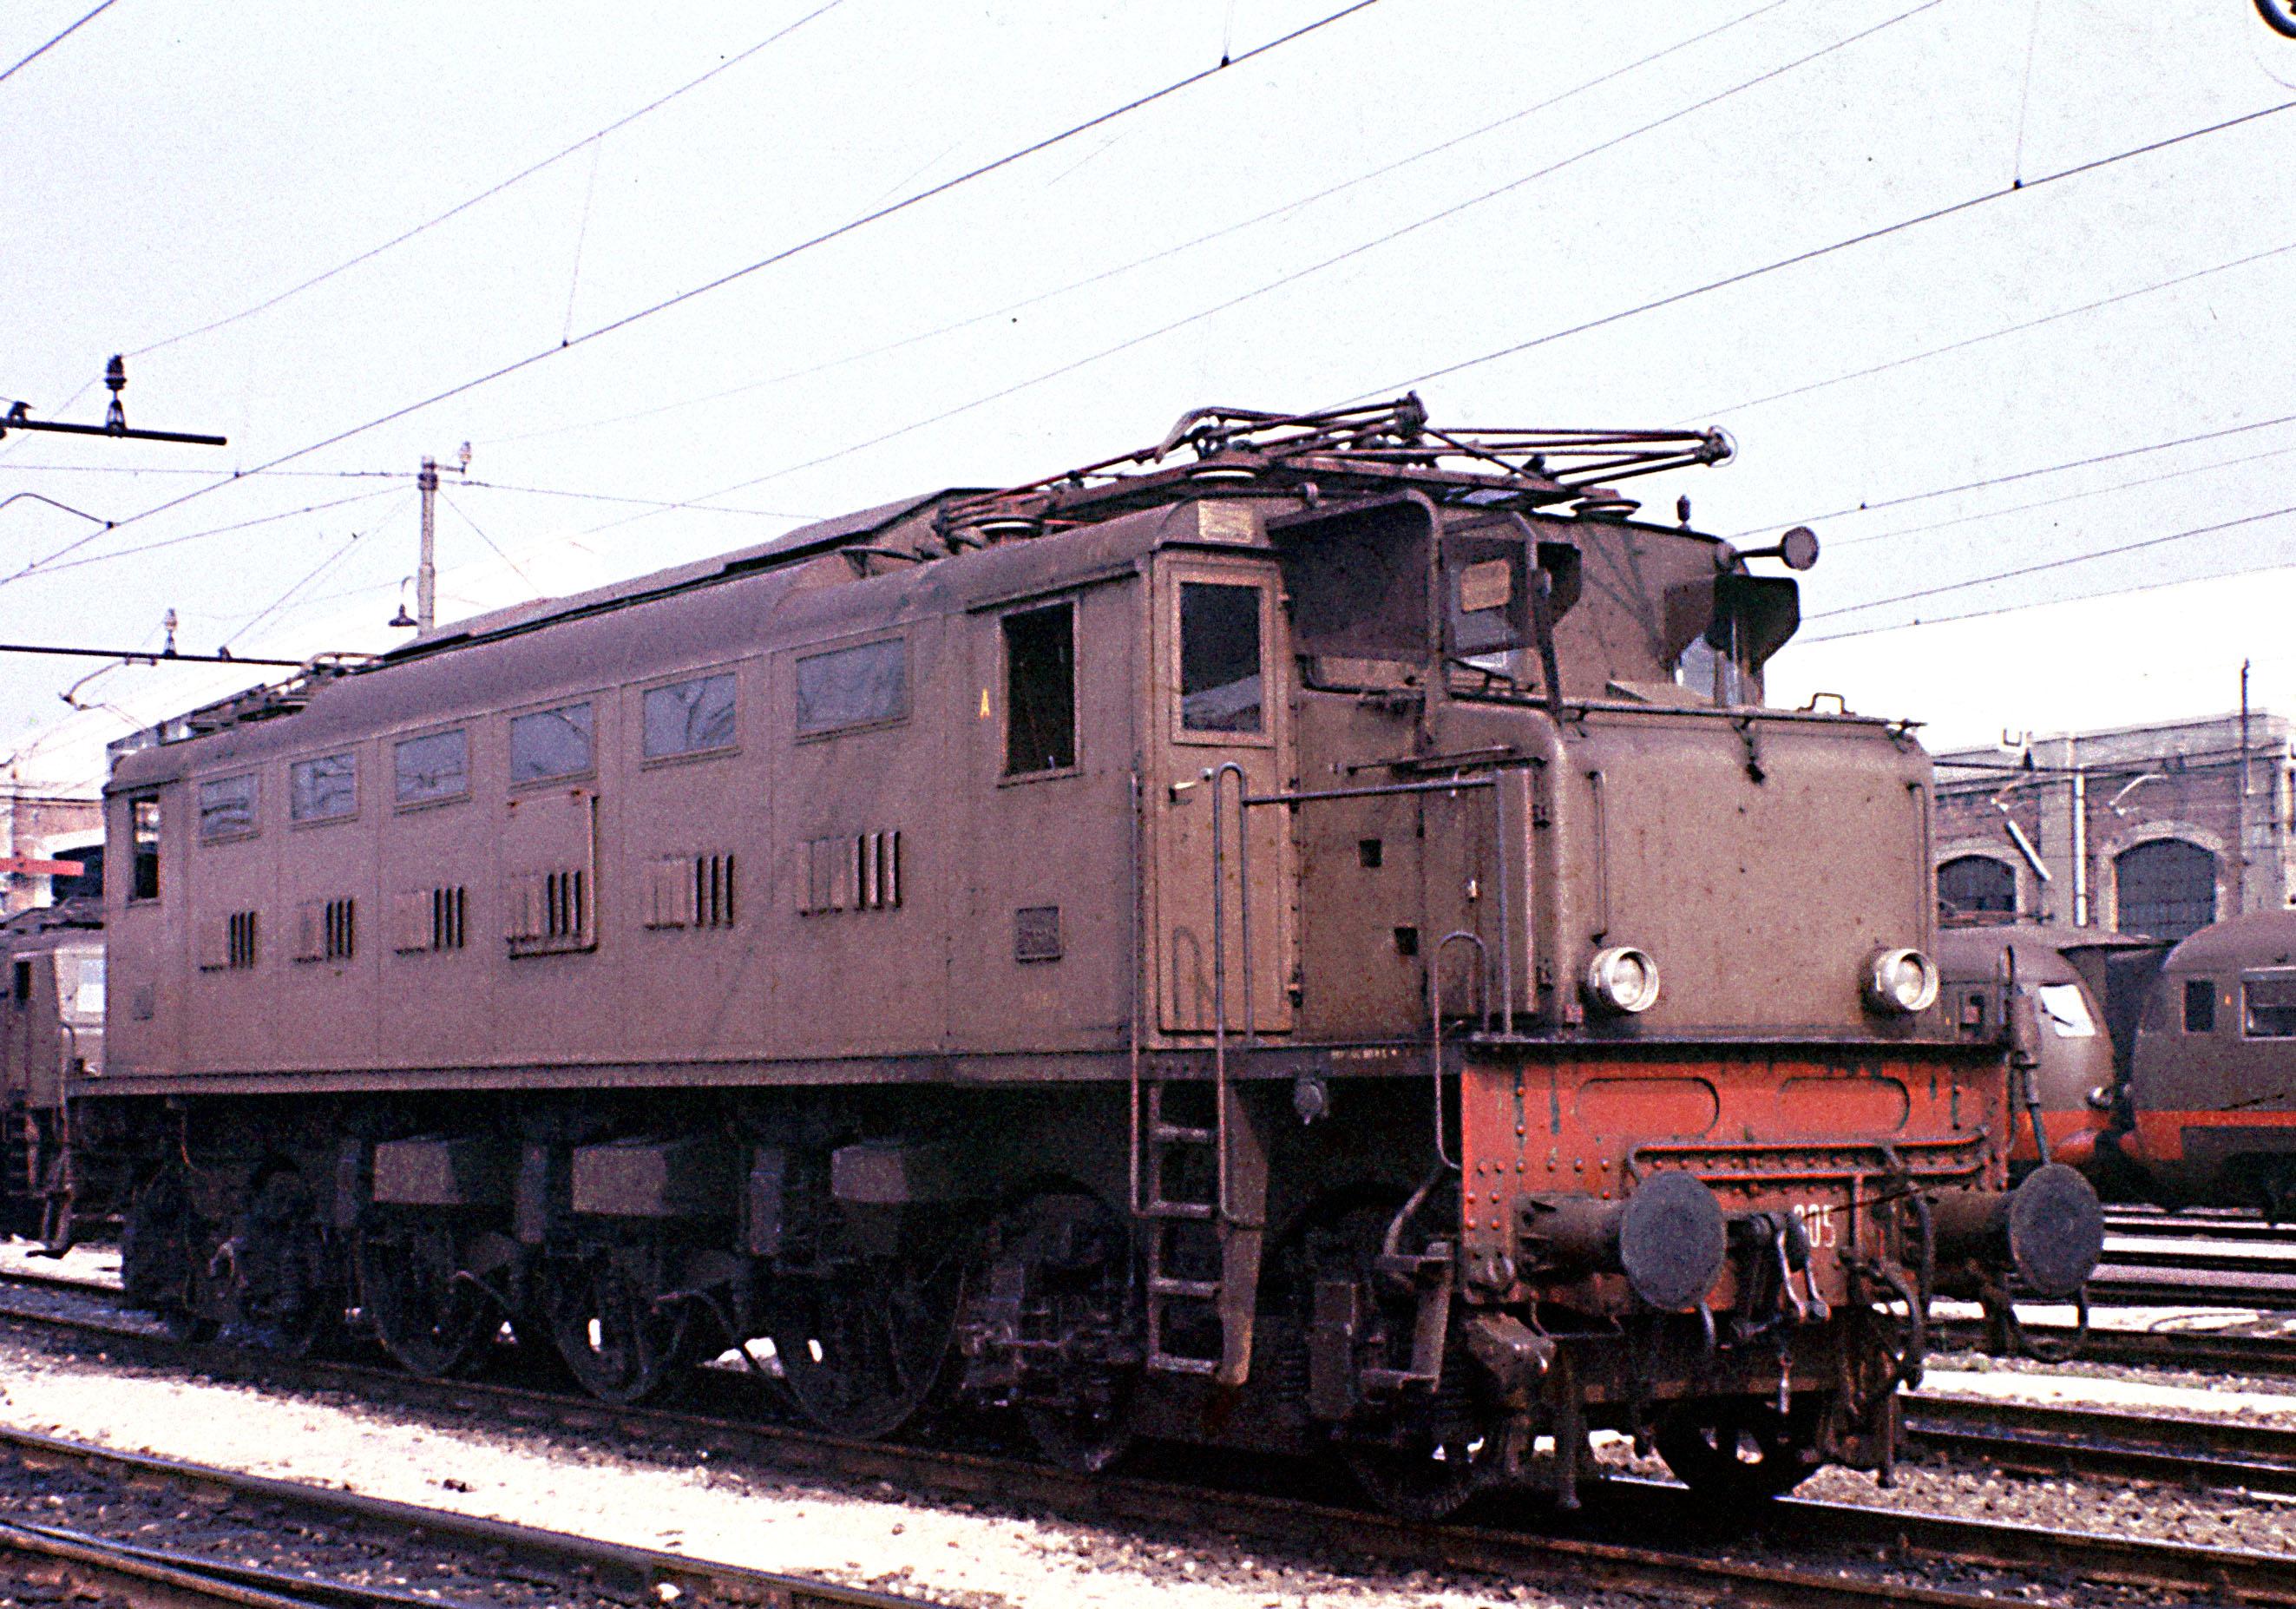 File:Locomotore E326 005.jpg - Wikimedia Commons